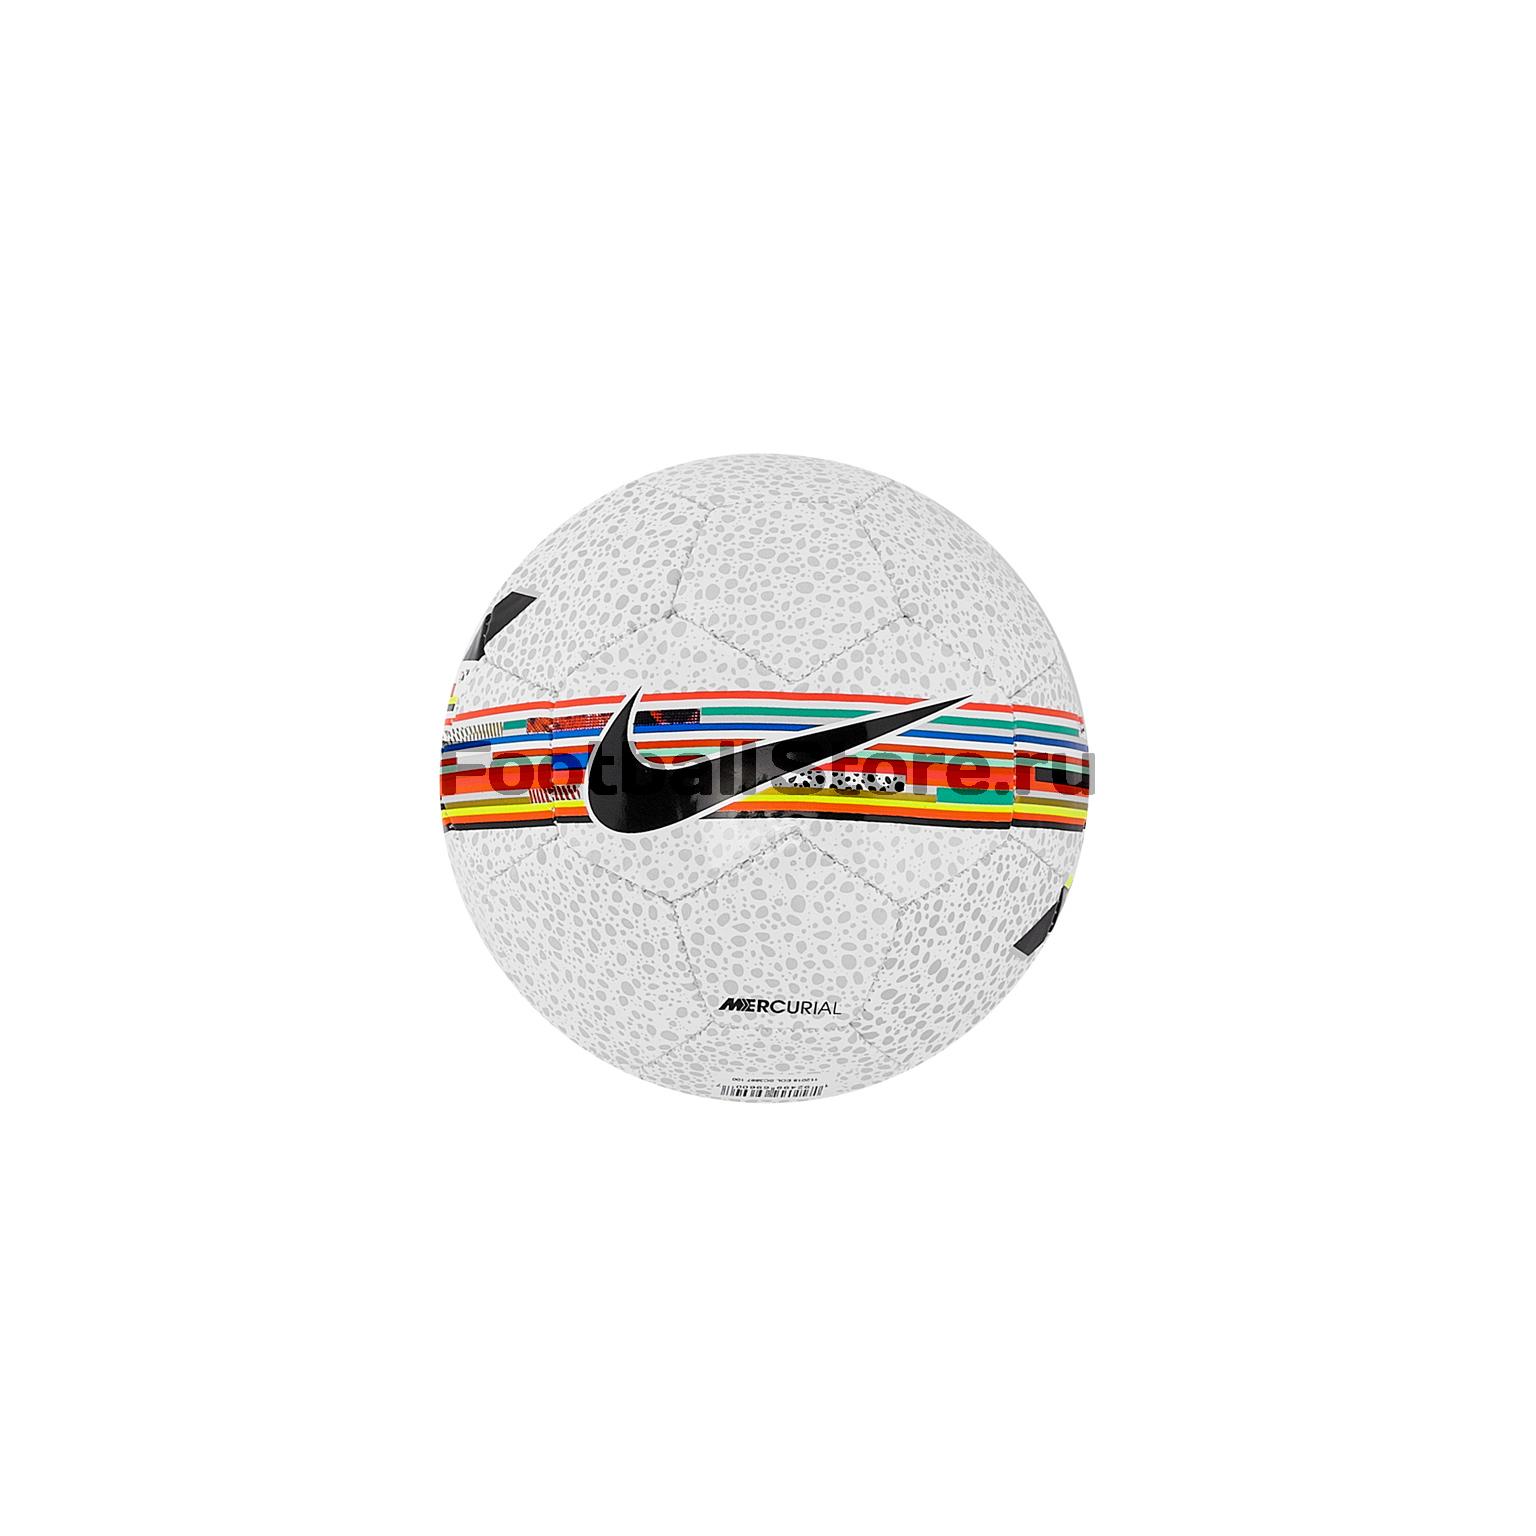 Мяч сувенирный Nike Mercurial Skills SC3897-100 обувь для зала nike mercurial x finale ii ic 831974 616